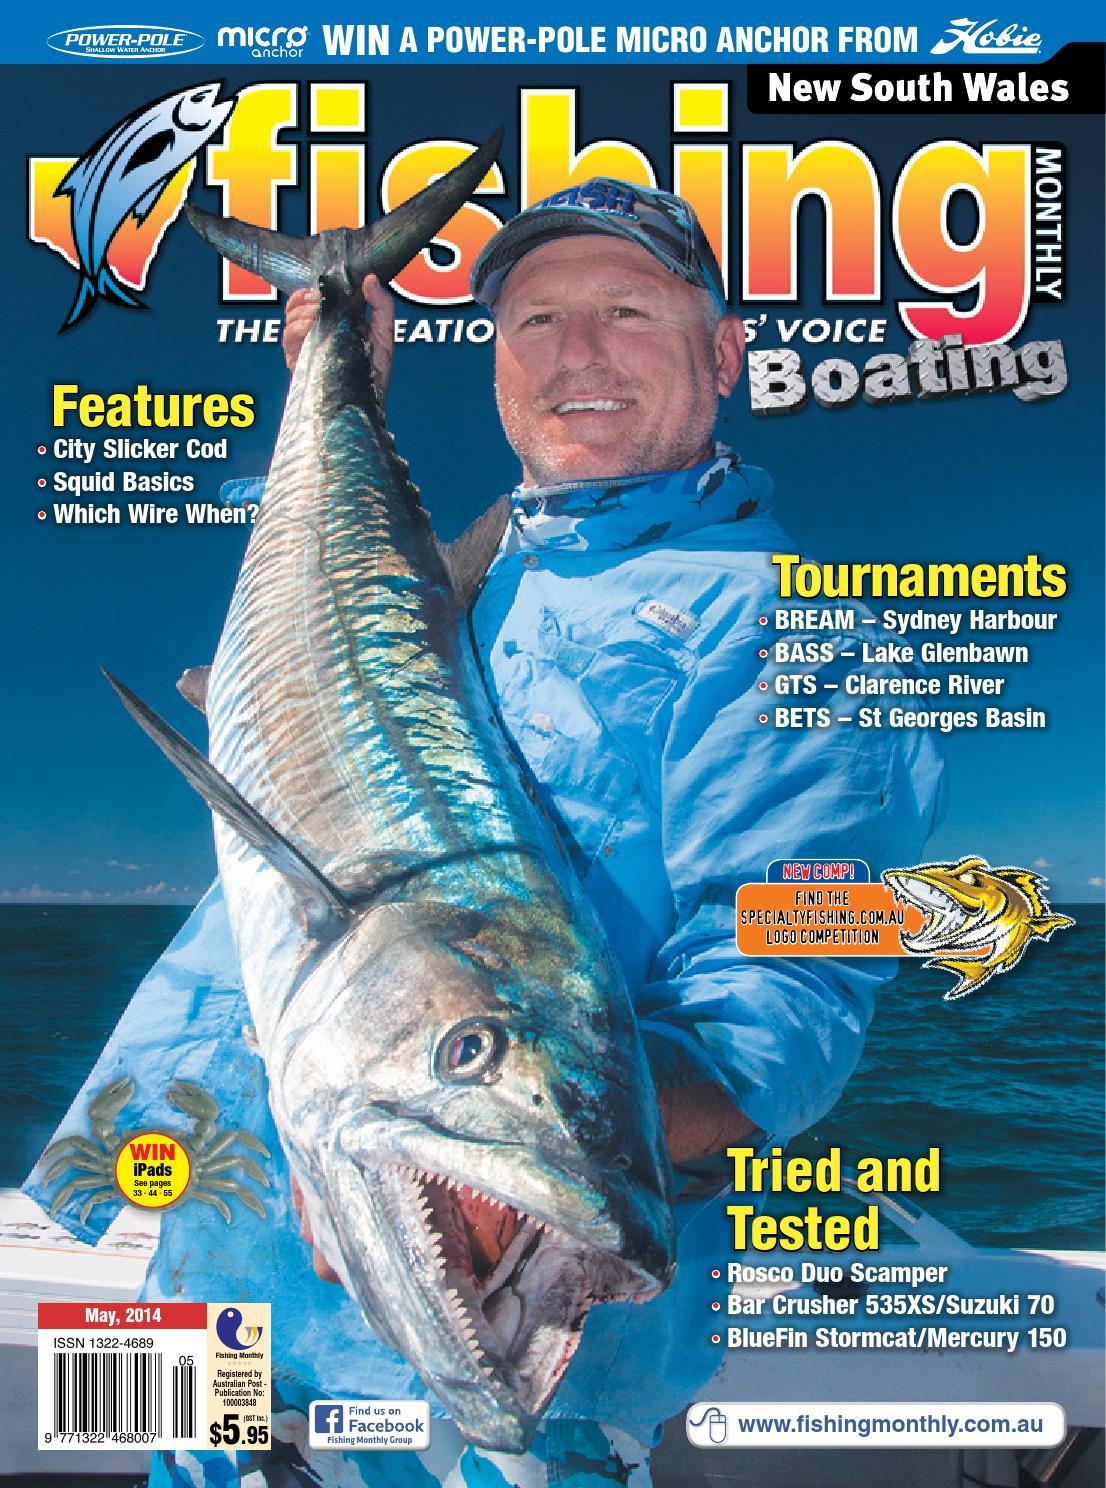 Custom Painted Bass Snax Crank Bait Mega 130 Fishing Lure Ghost Tenacious Thread